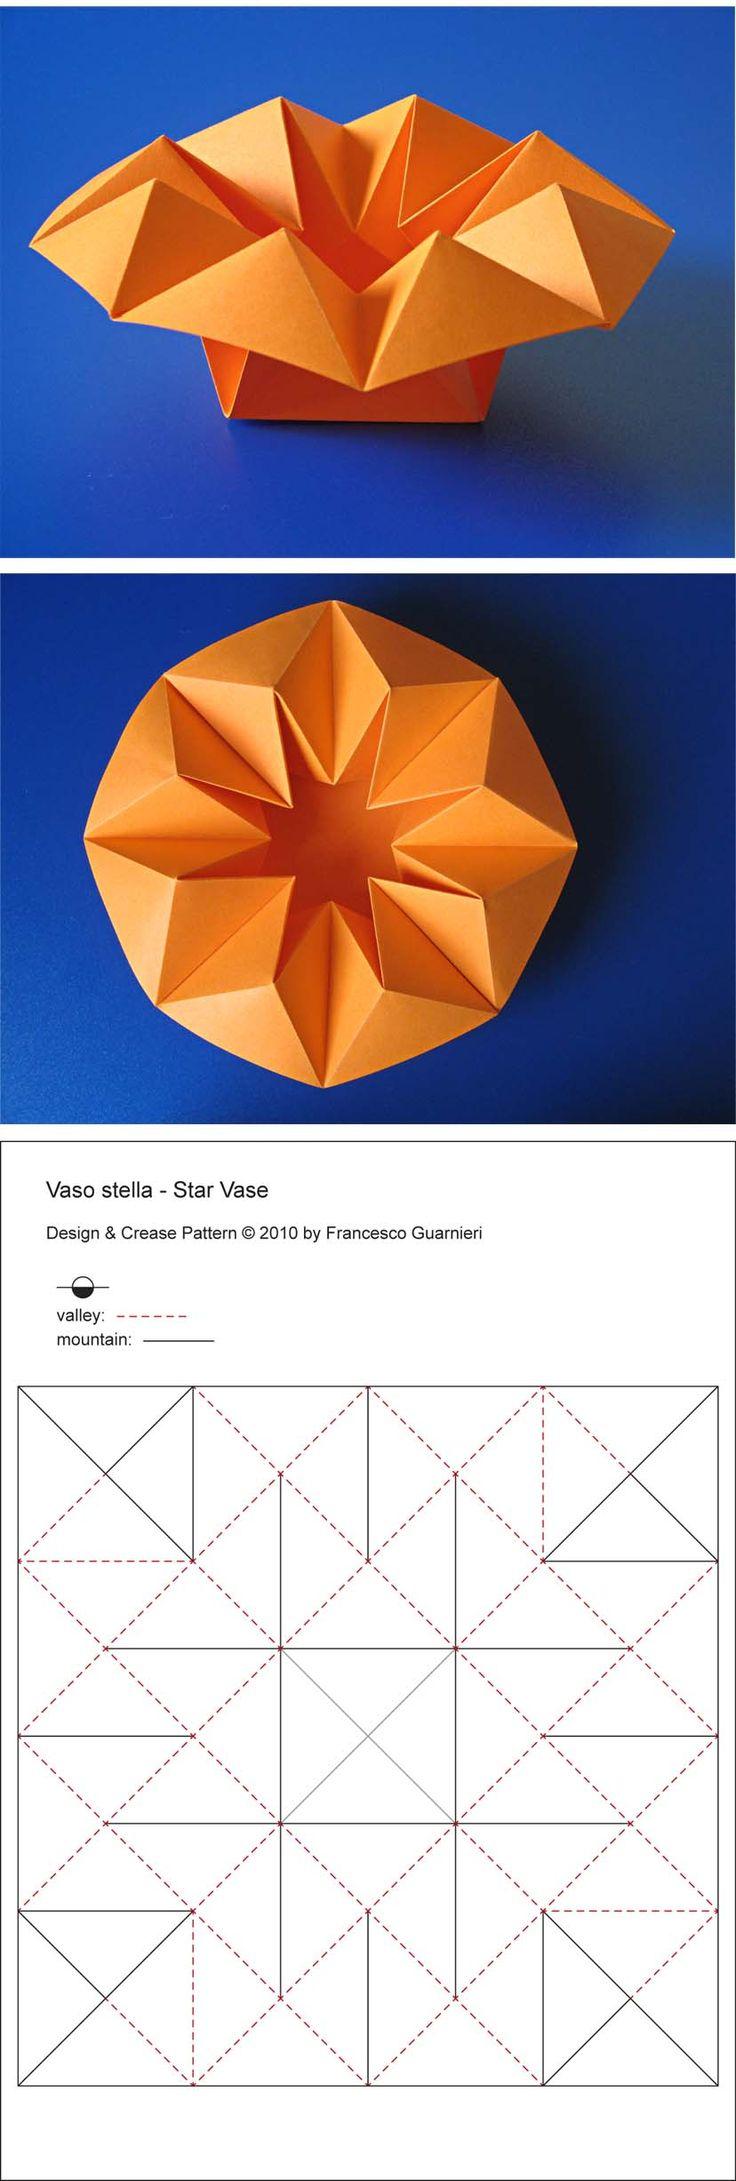 Origami box, CP: Vaso stella - Star Vase, from one uncut square of copy paper, 21 x 21 cm. Designed and folded by Francesco Guarnieri, April 2010.